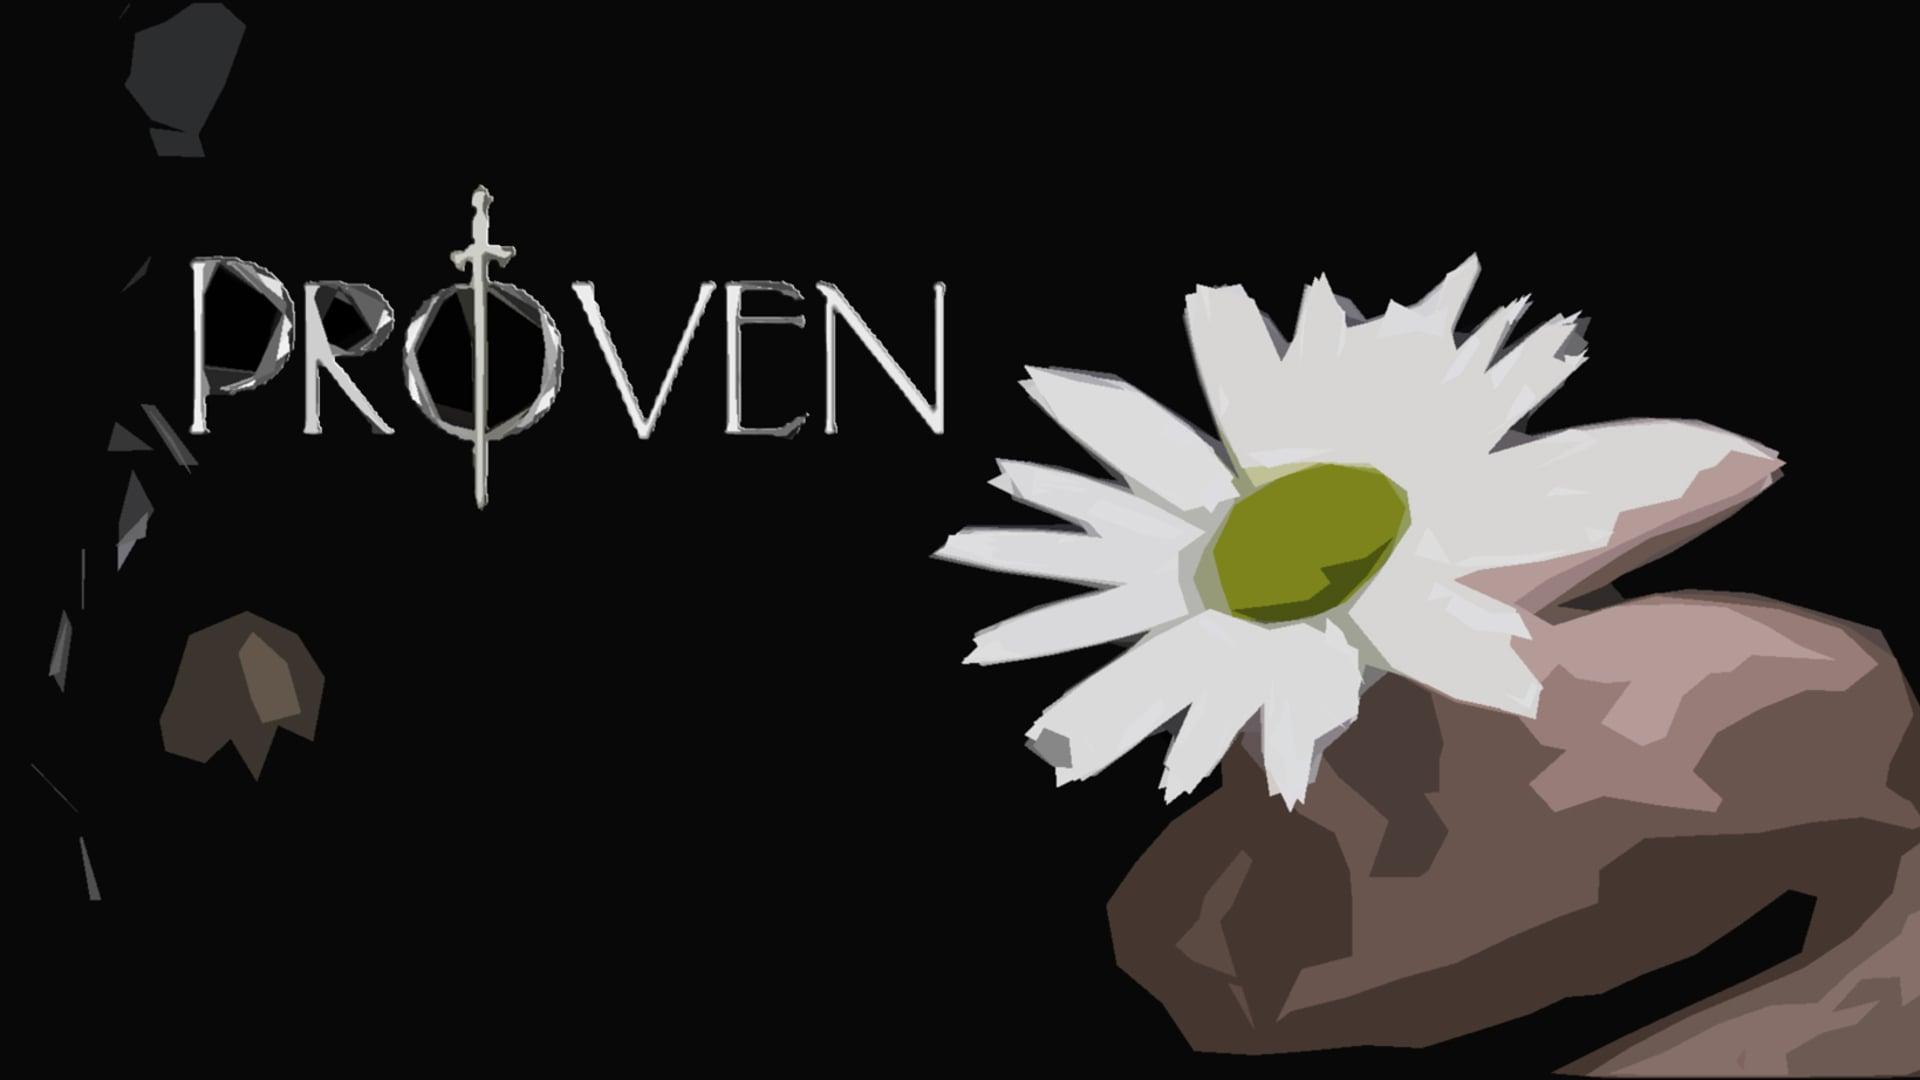 Proven: The Kingdom Saga